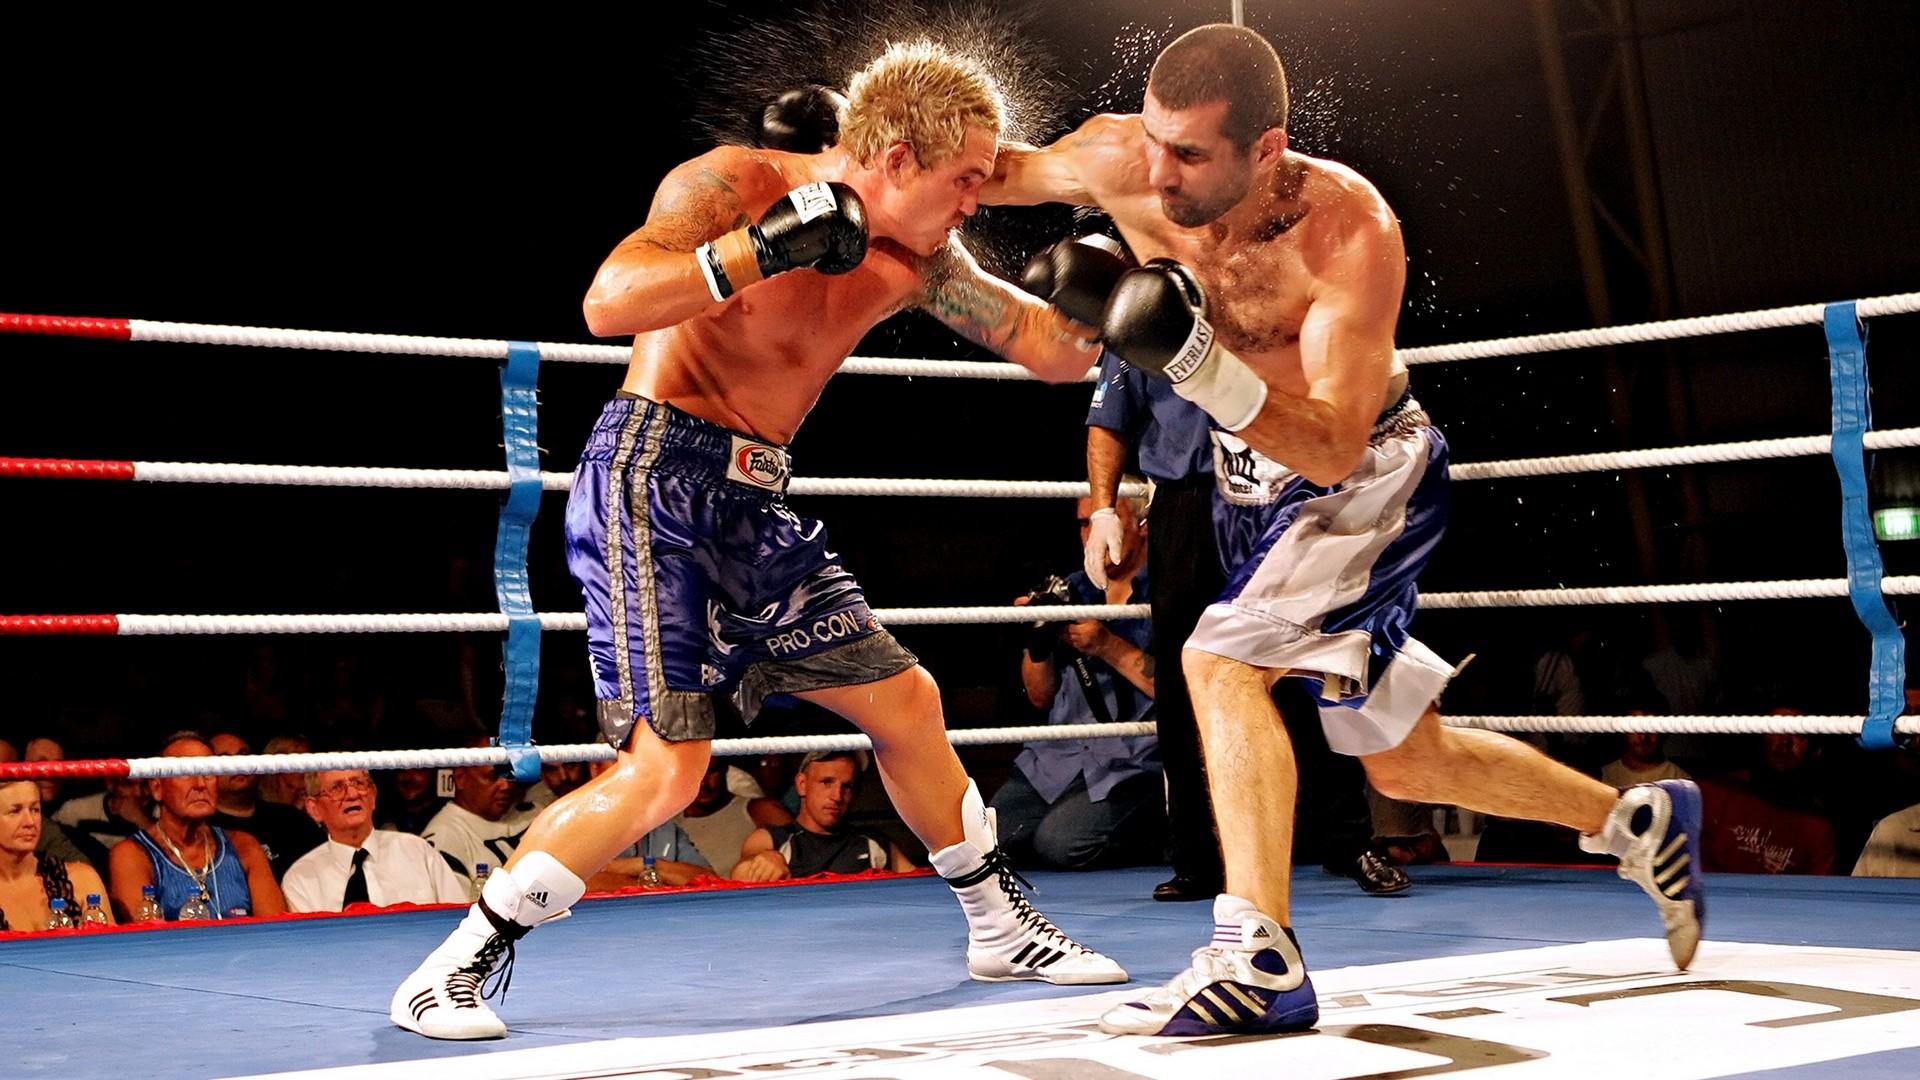 Wallpaper Boxing, Ring, Struggle, Blow